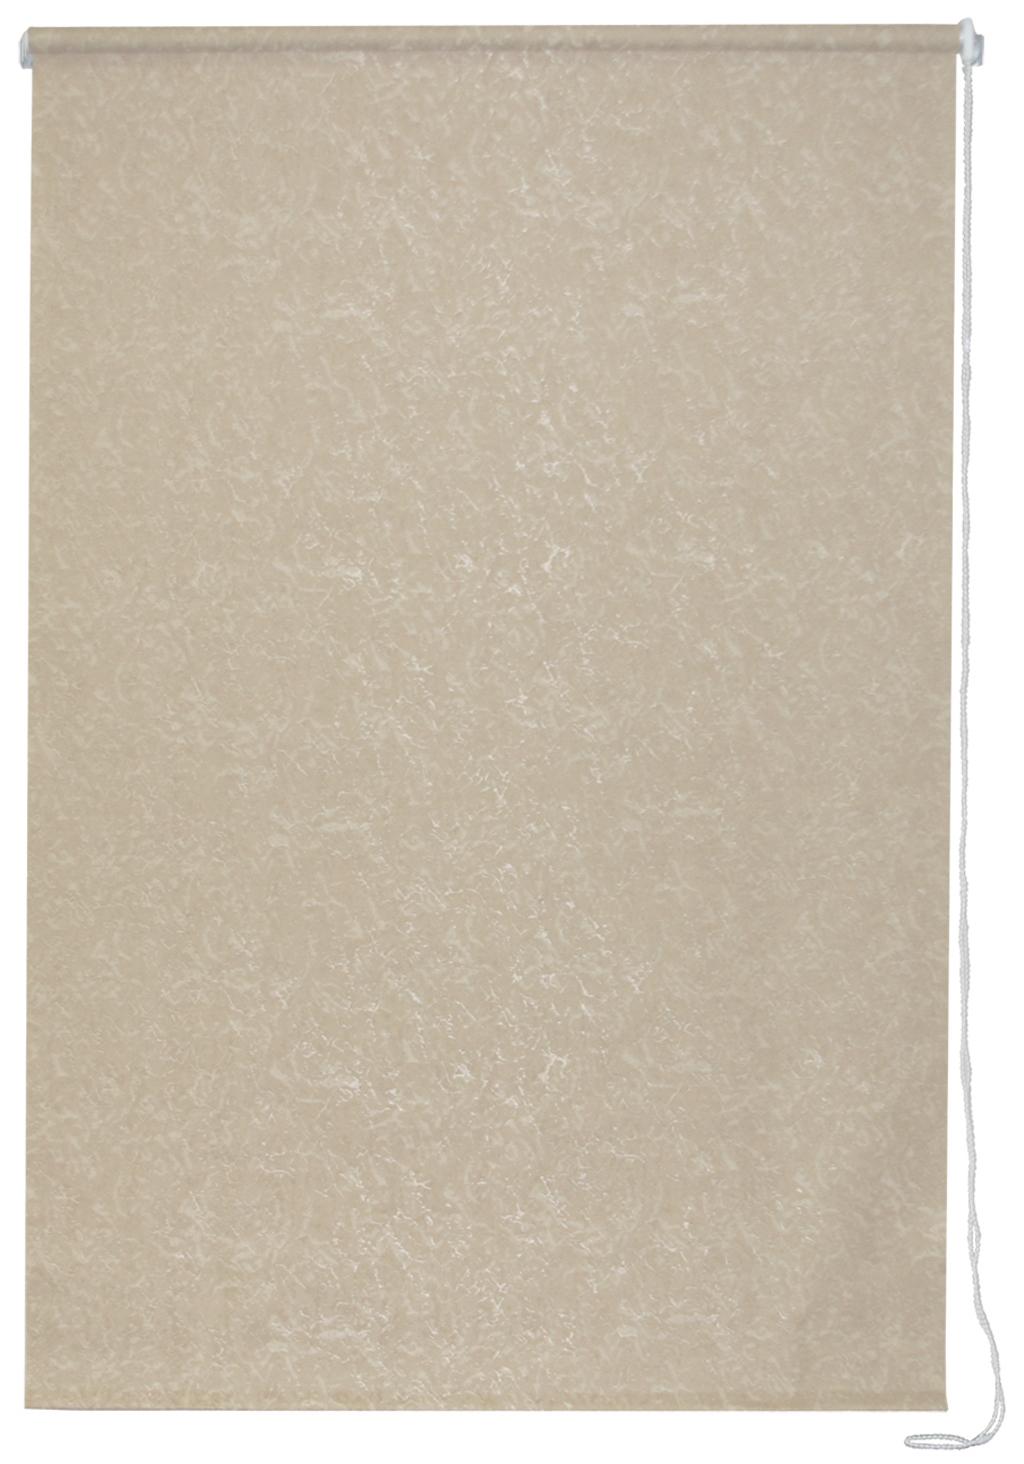 Рулонная штора УЮТРулонные шторы<br>Коллекция: Фрост,<br>Материал: полиэстер,<br>Цвет: бежевый,<br>Размеры: 500х1750,<br>Ширина: 500,<br>Высота (см): 175<br>